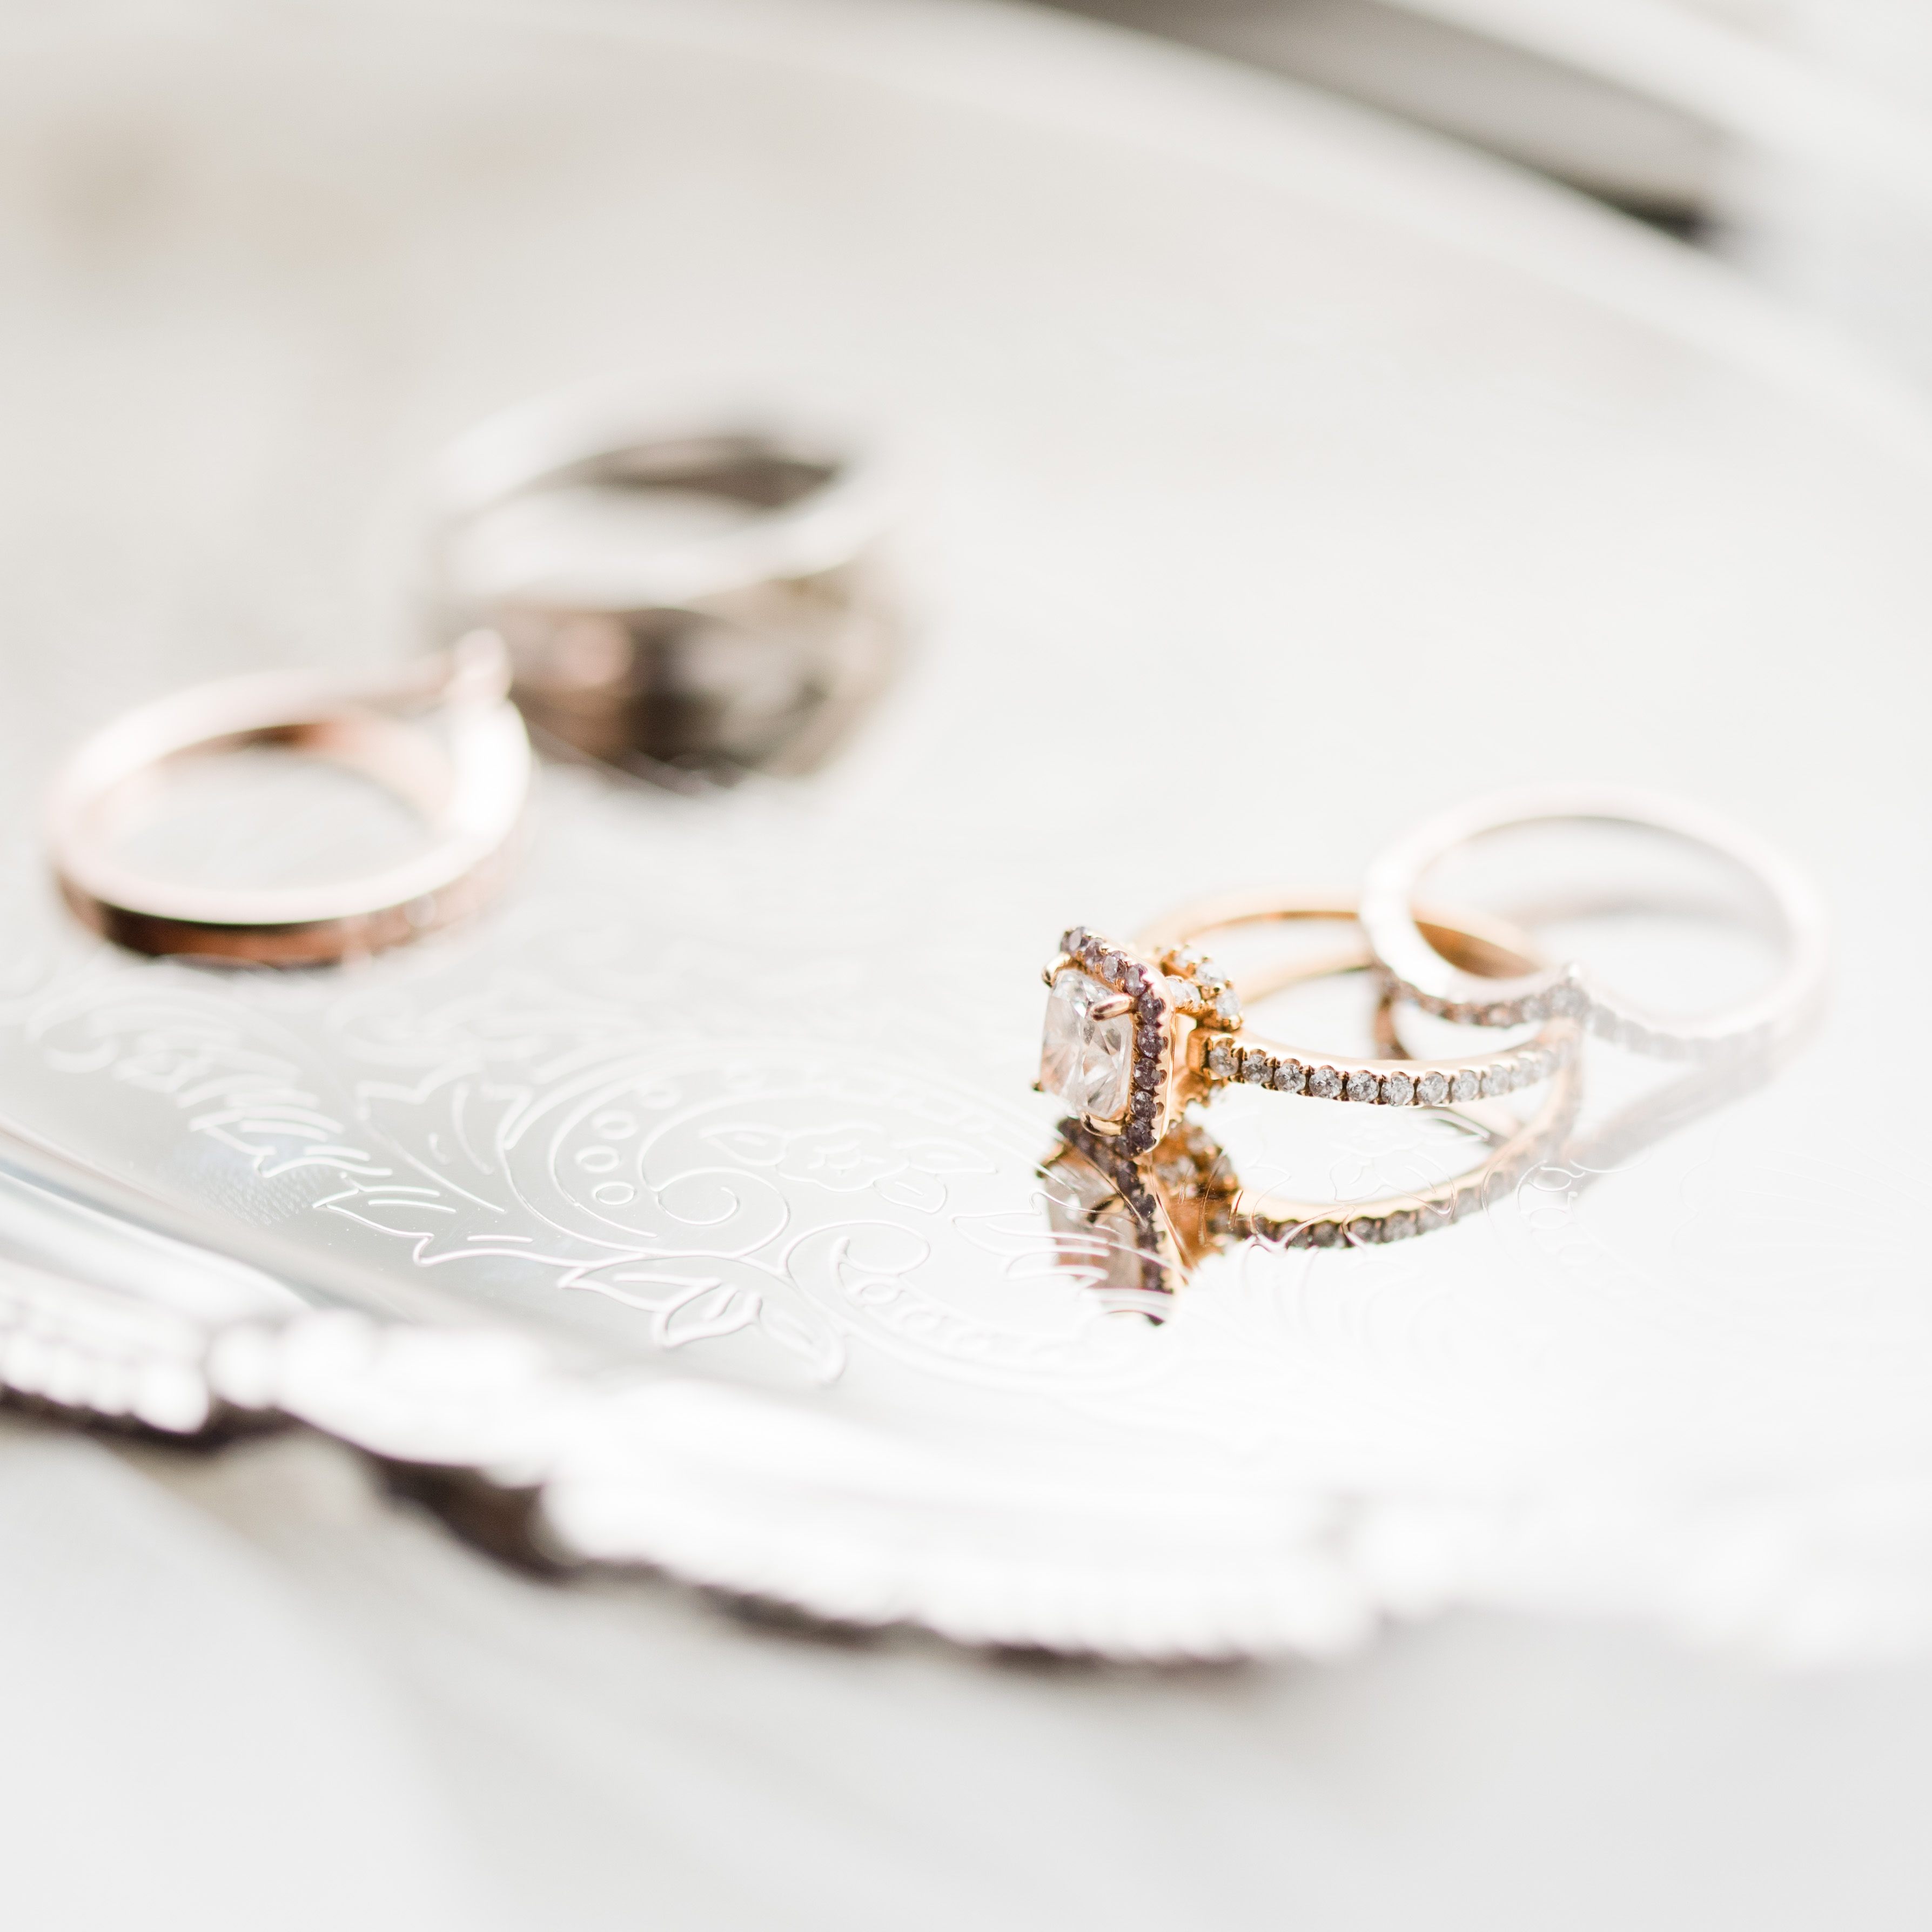 rose gold engagement ring, engagement ring, rose gold ring set, Boston photographer, wedding photography, MA wedding photographer, Gorton wedding photographer near Gibbet Hill